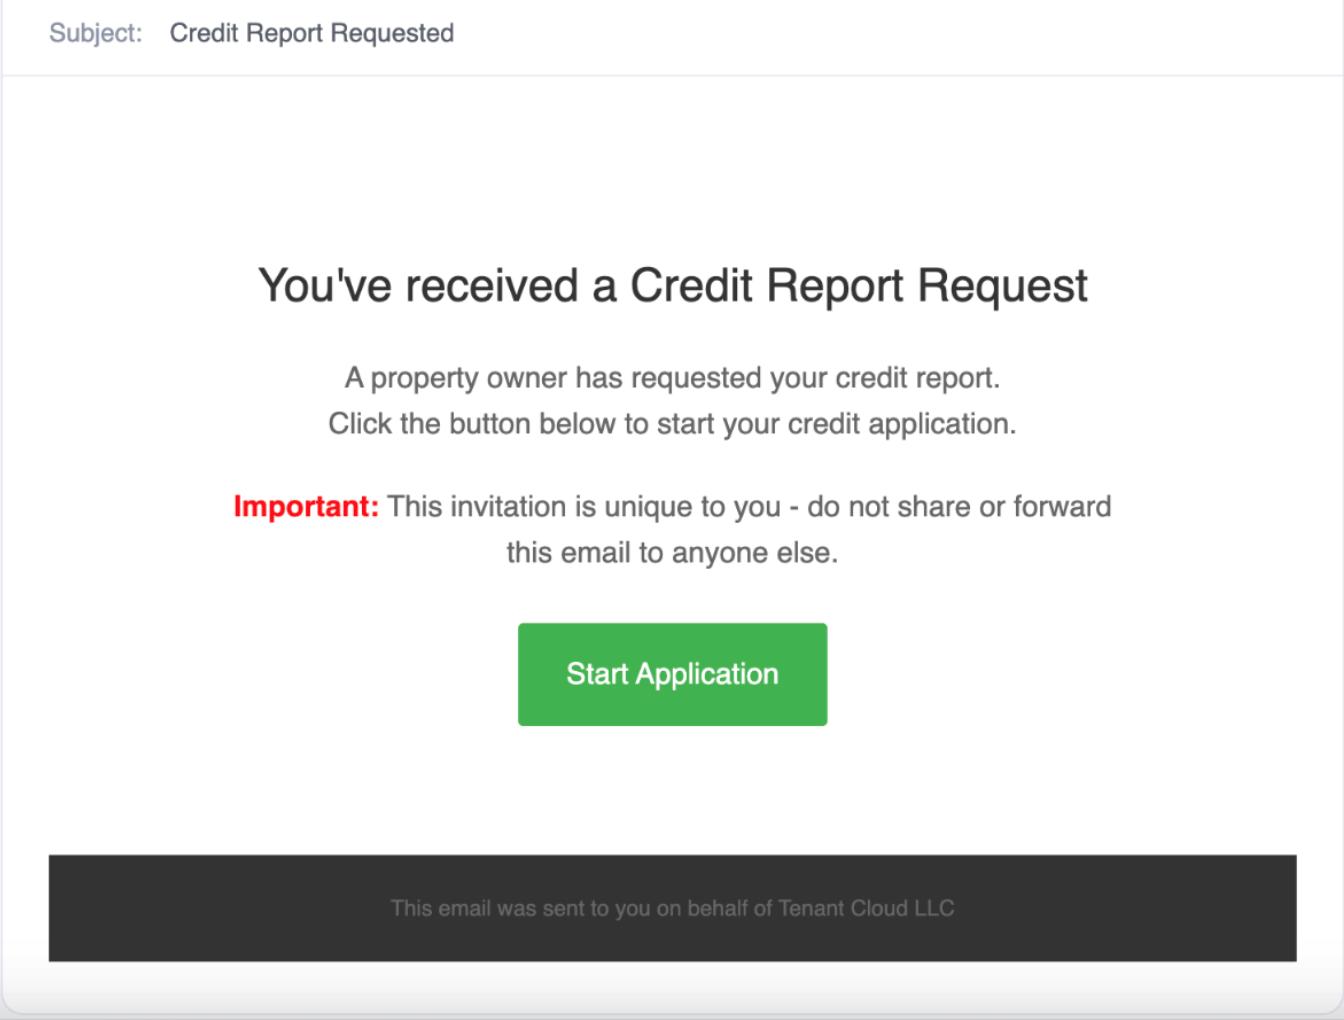 How do I run a background check?